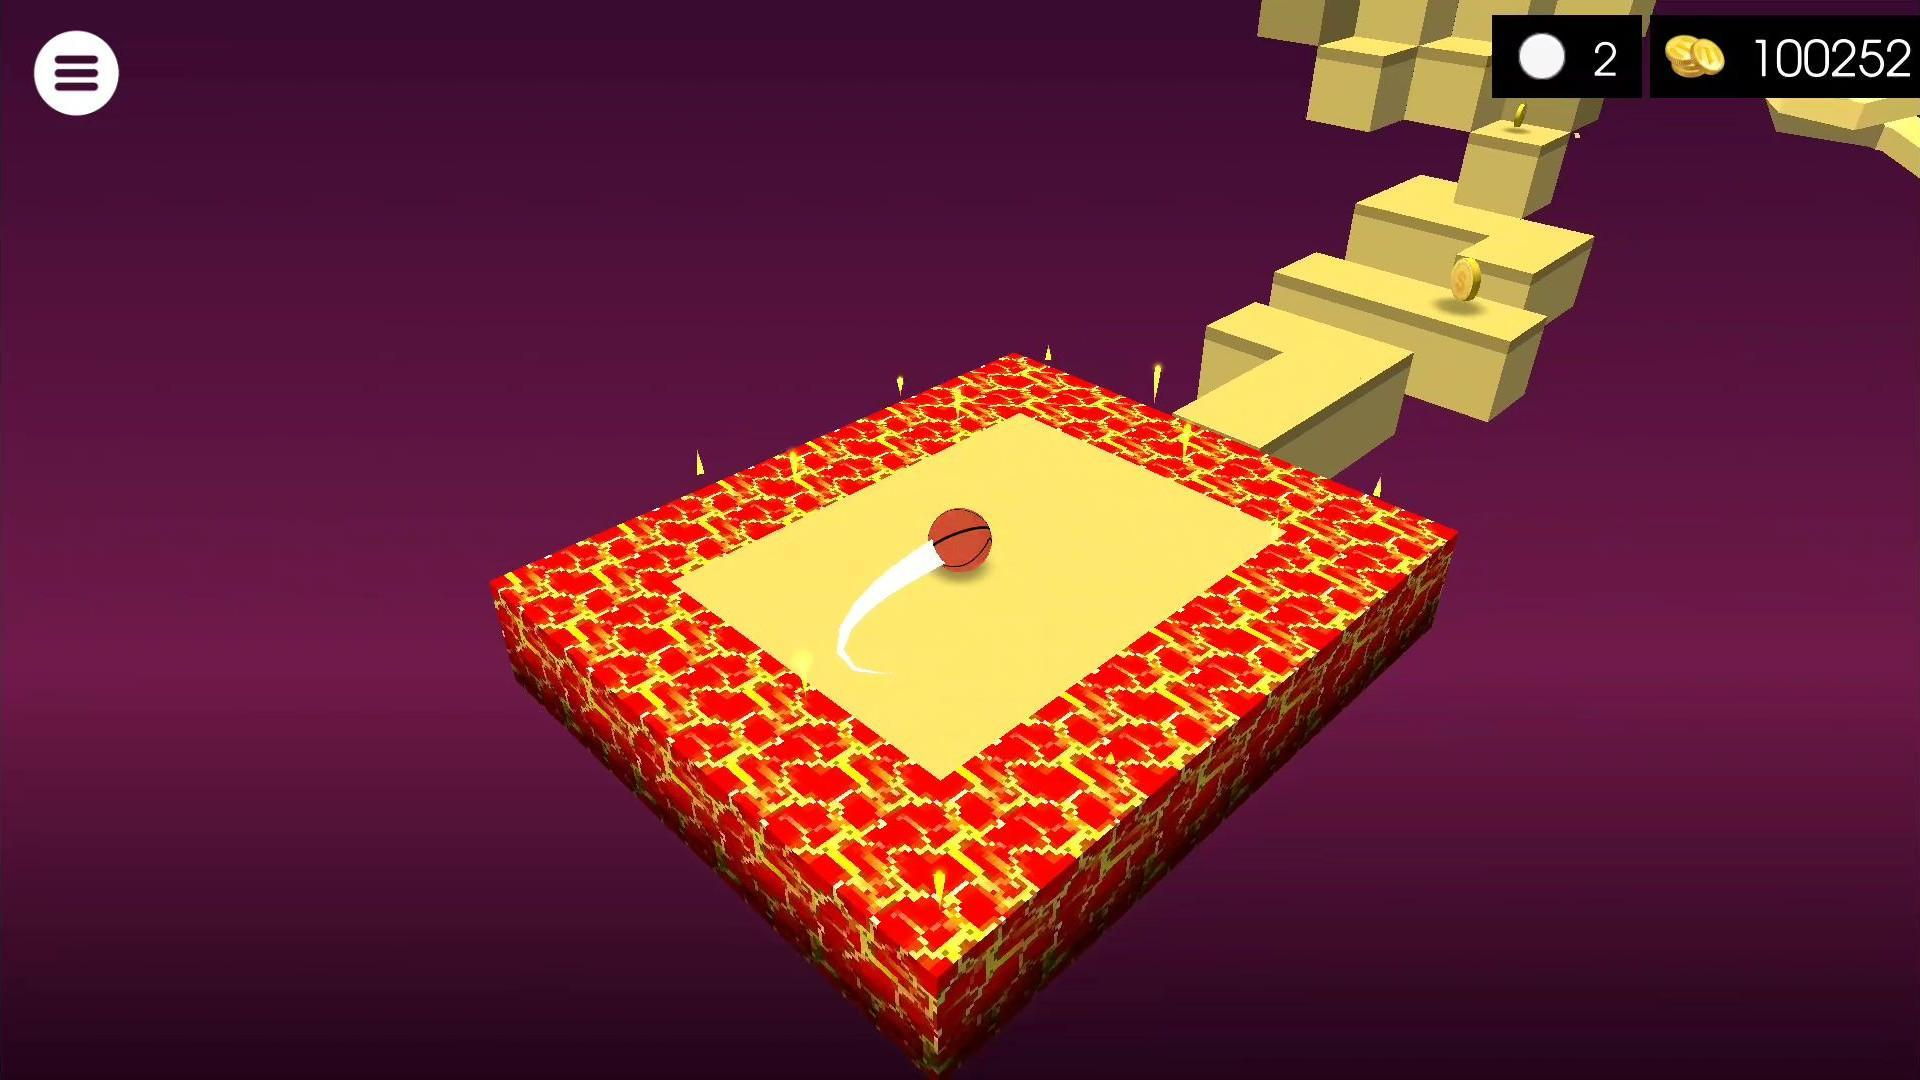 RYWO free 3D roll ball game 1.2.3 Screenshot 21